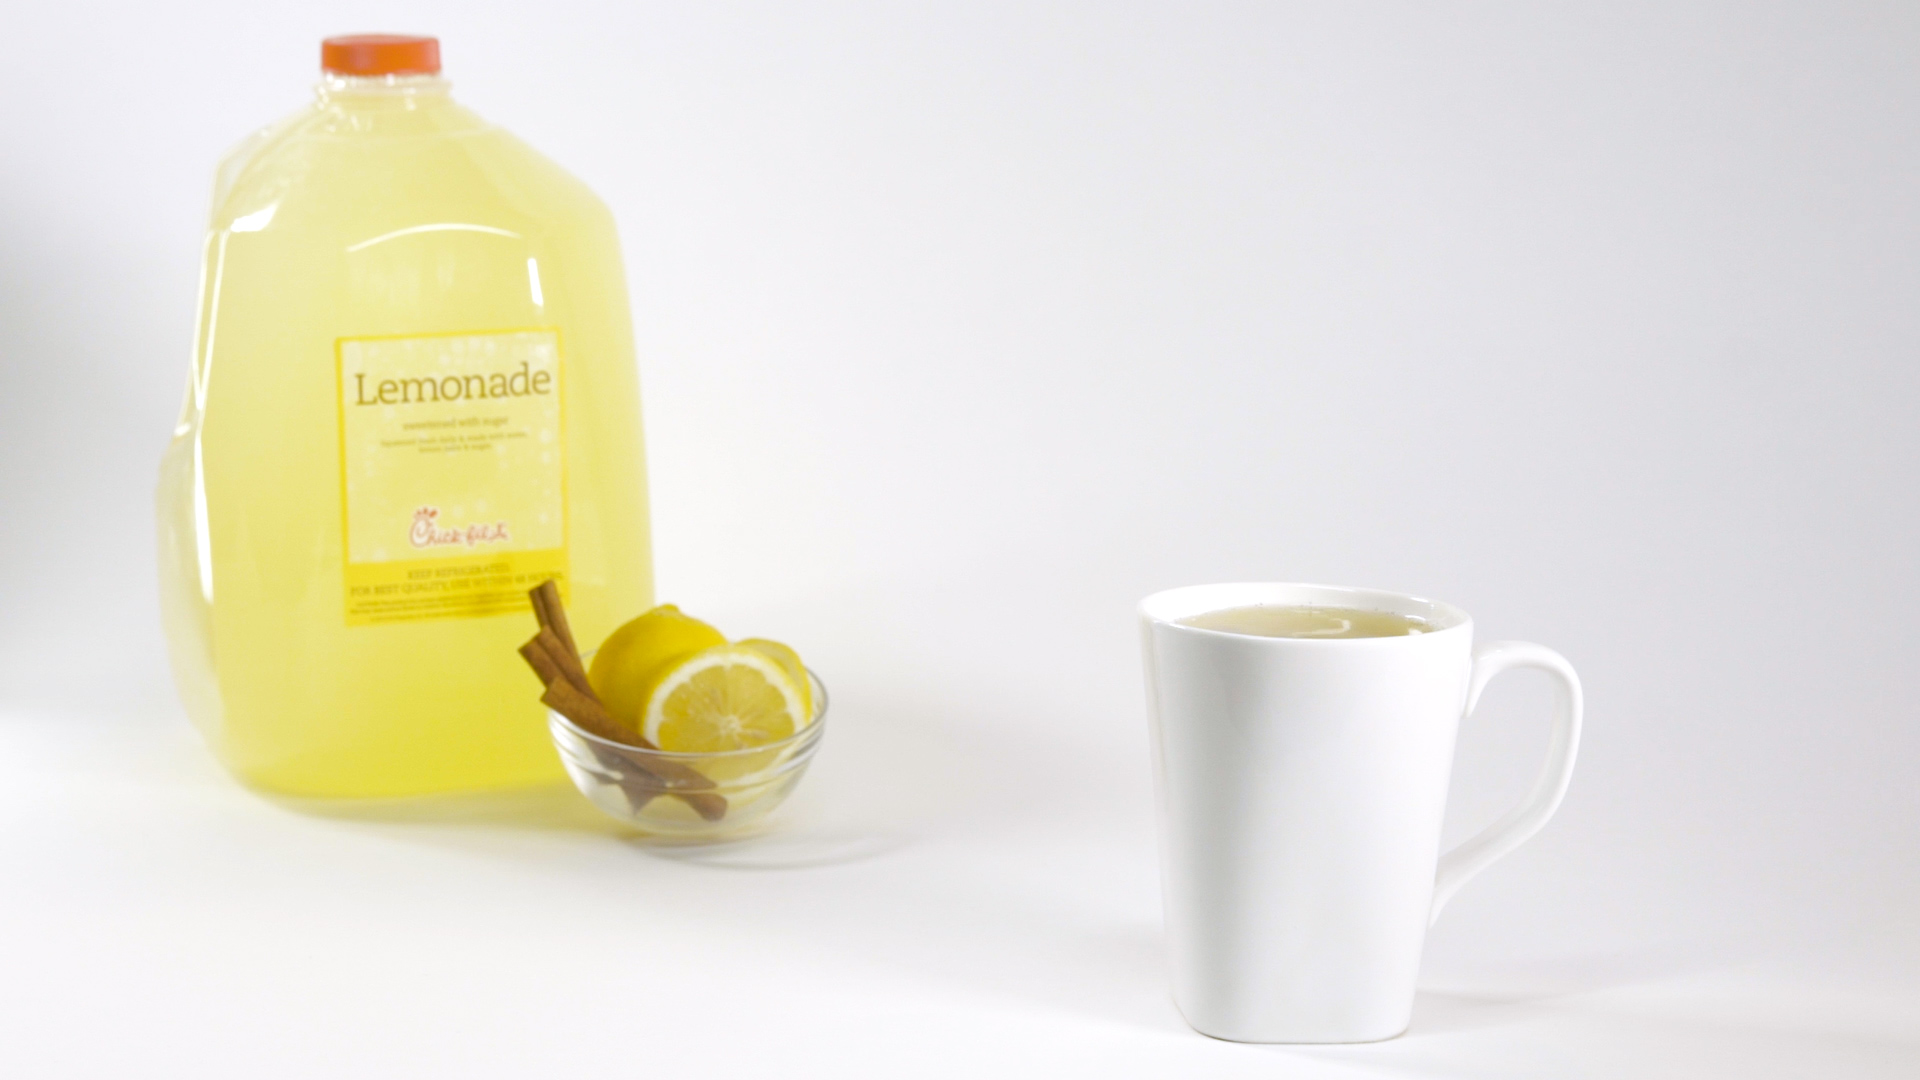 Lemonade container